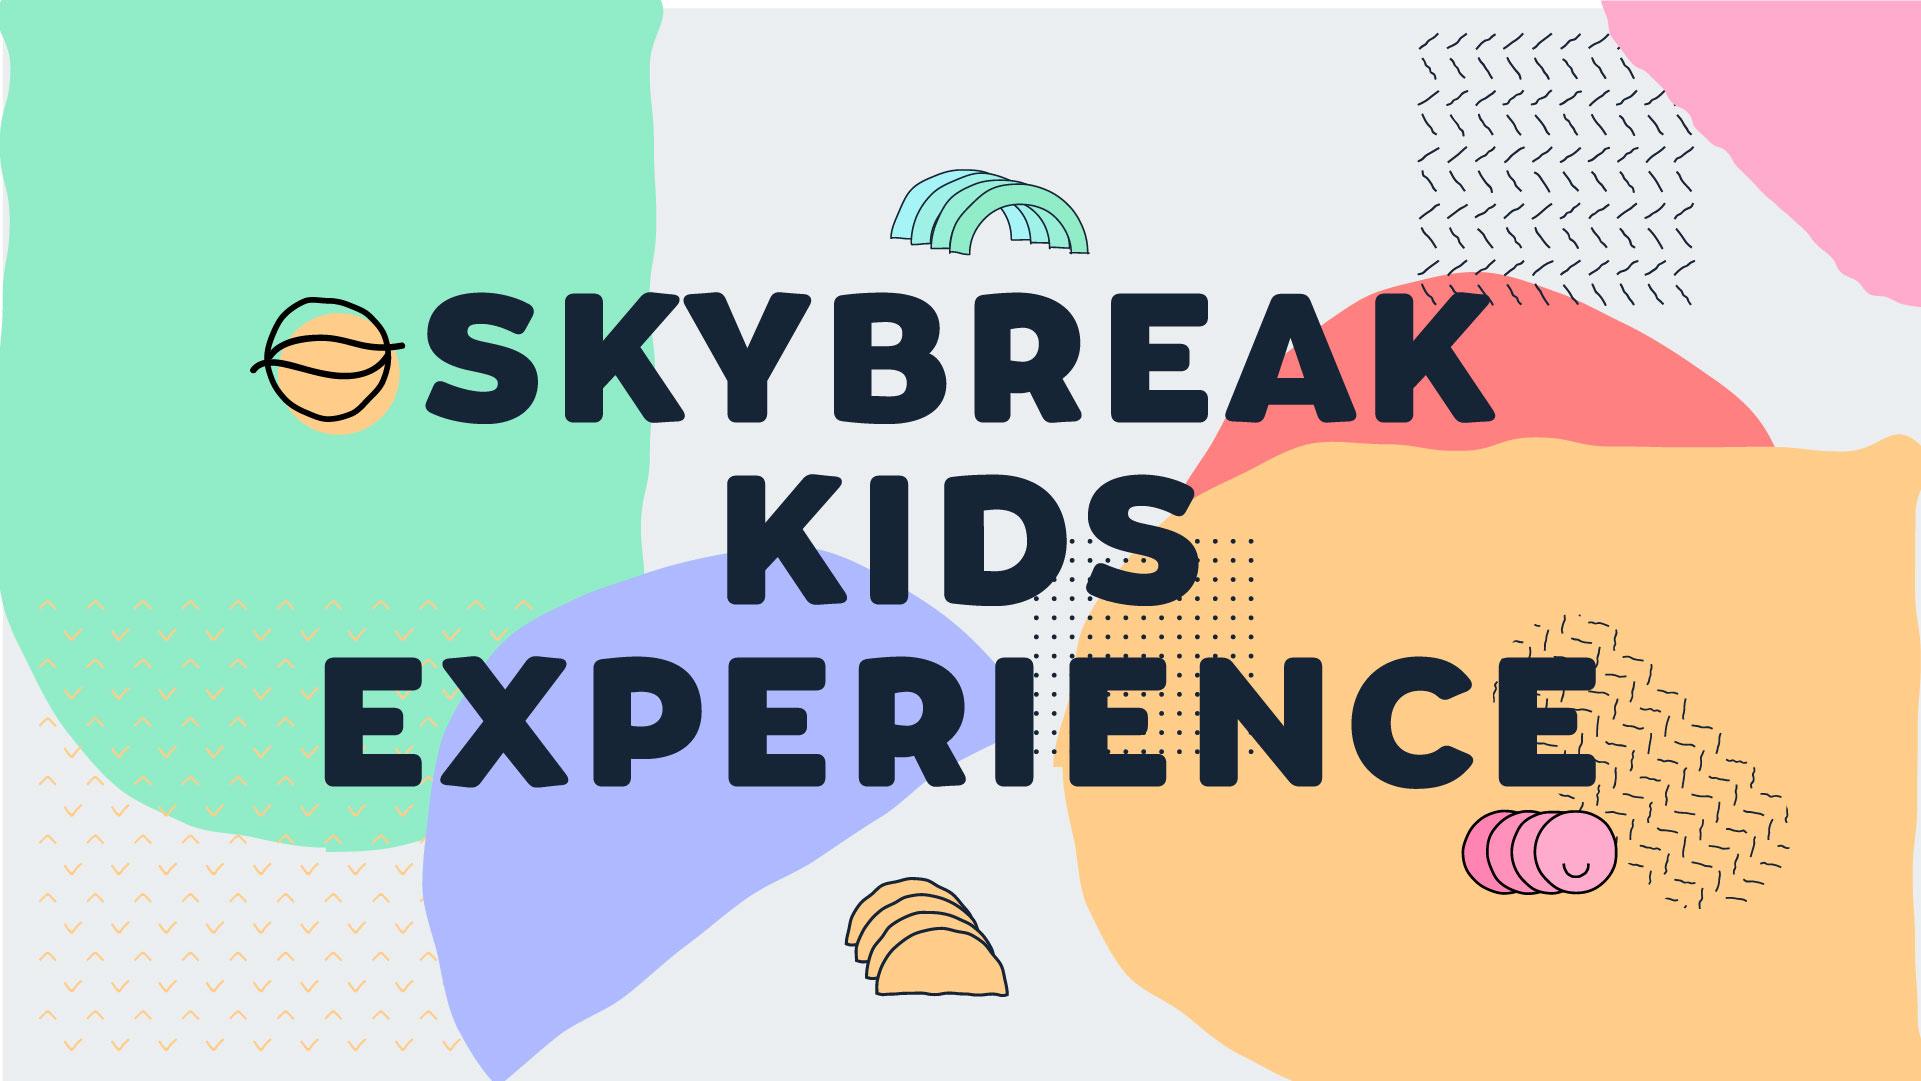 Skybreak Kids Experience